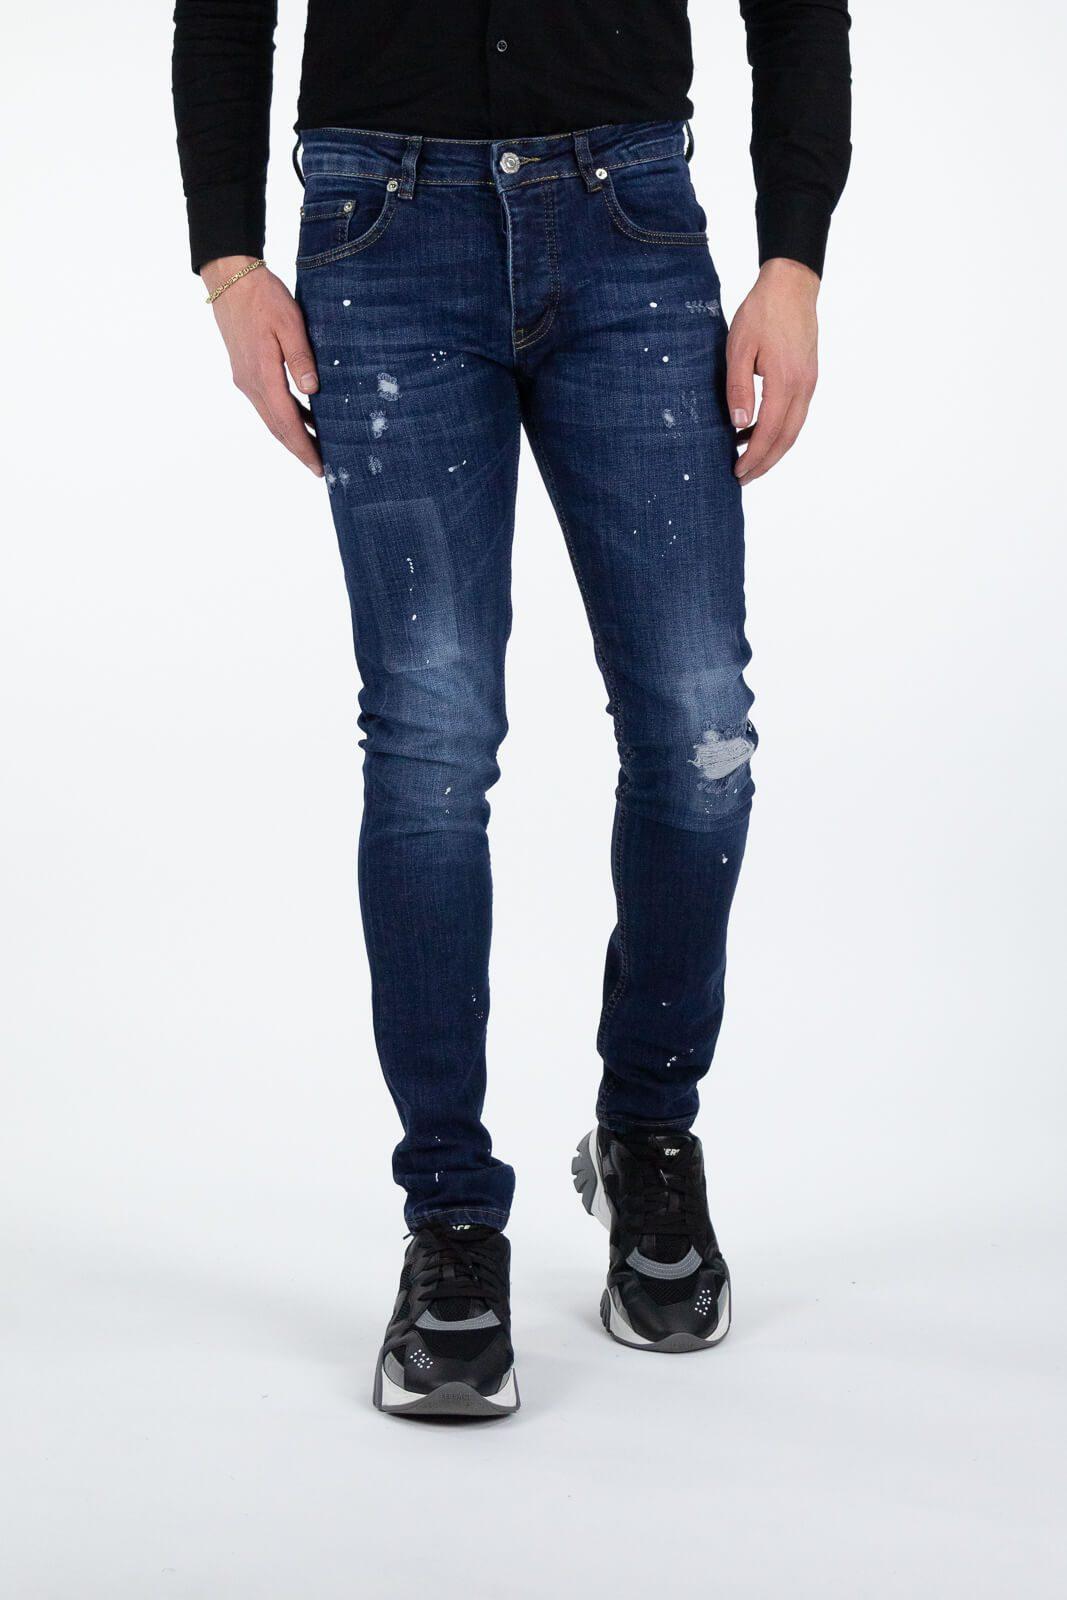 Talara Bleu Jeans-1